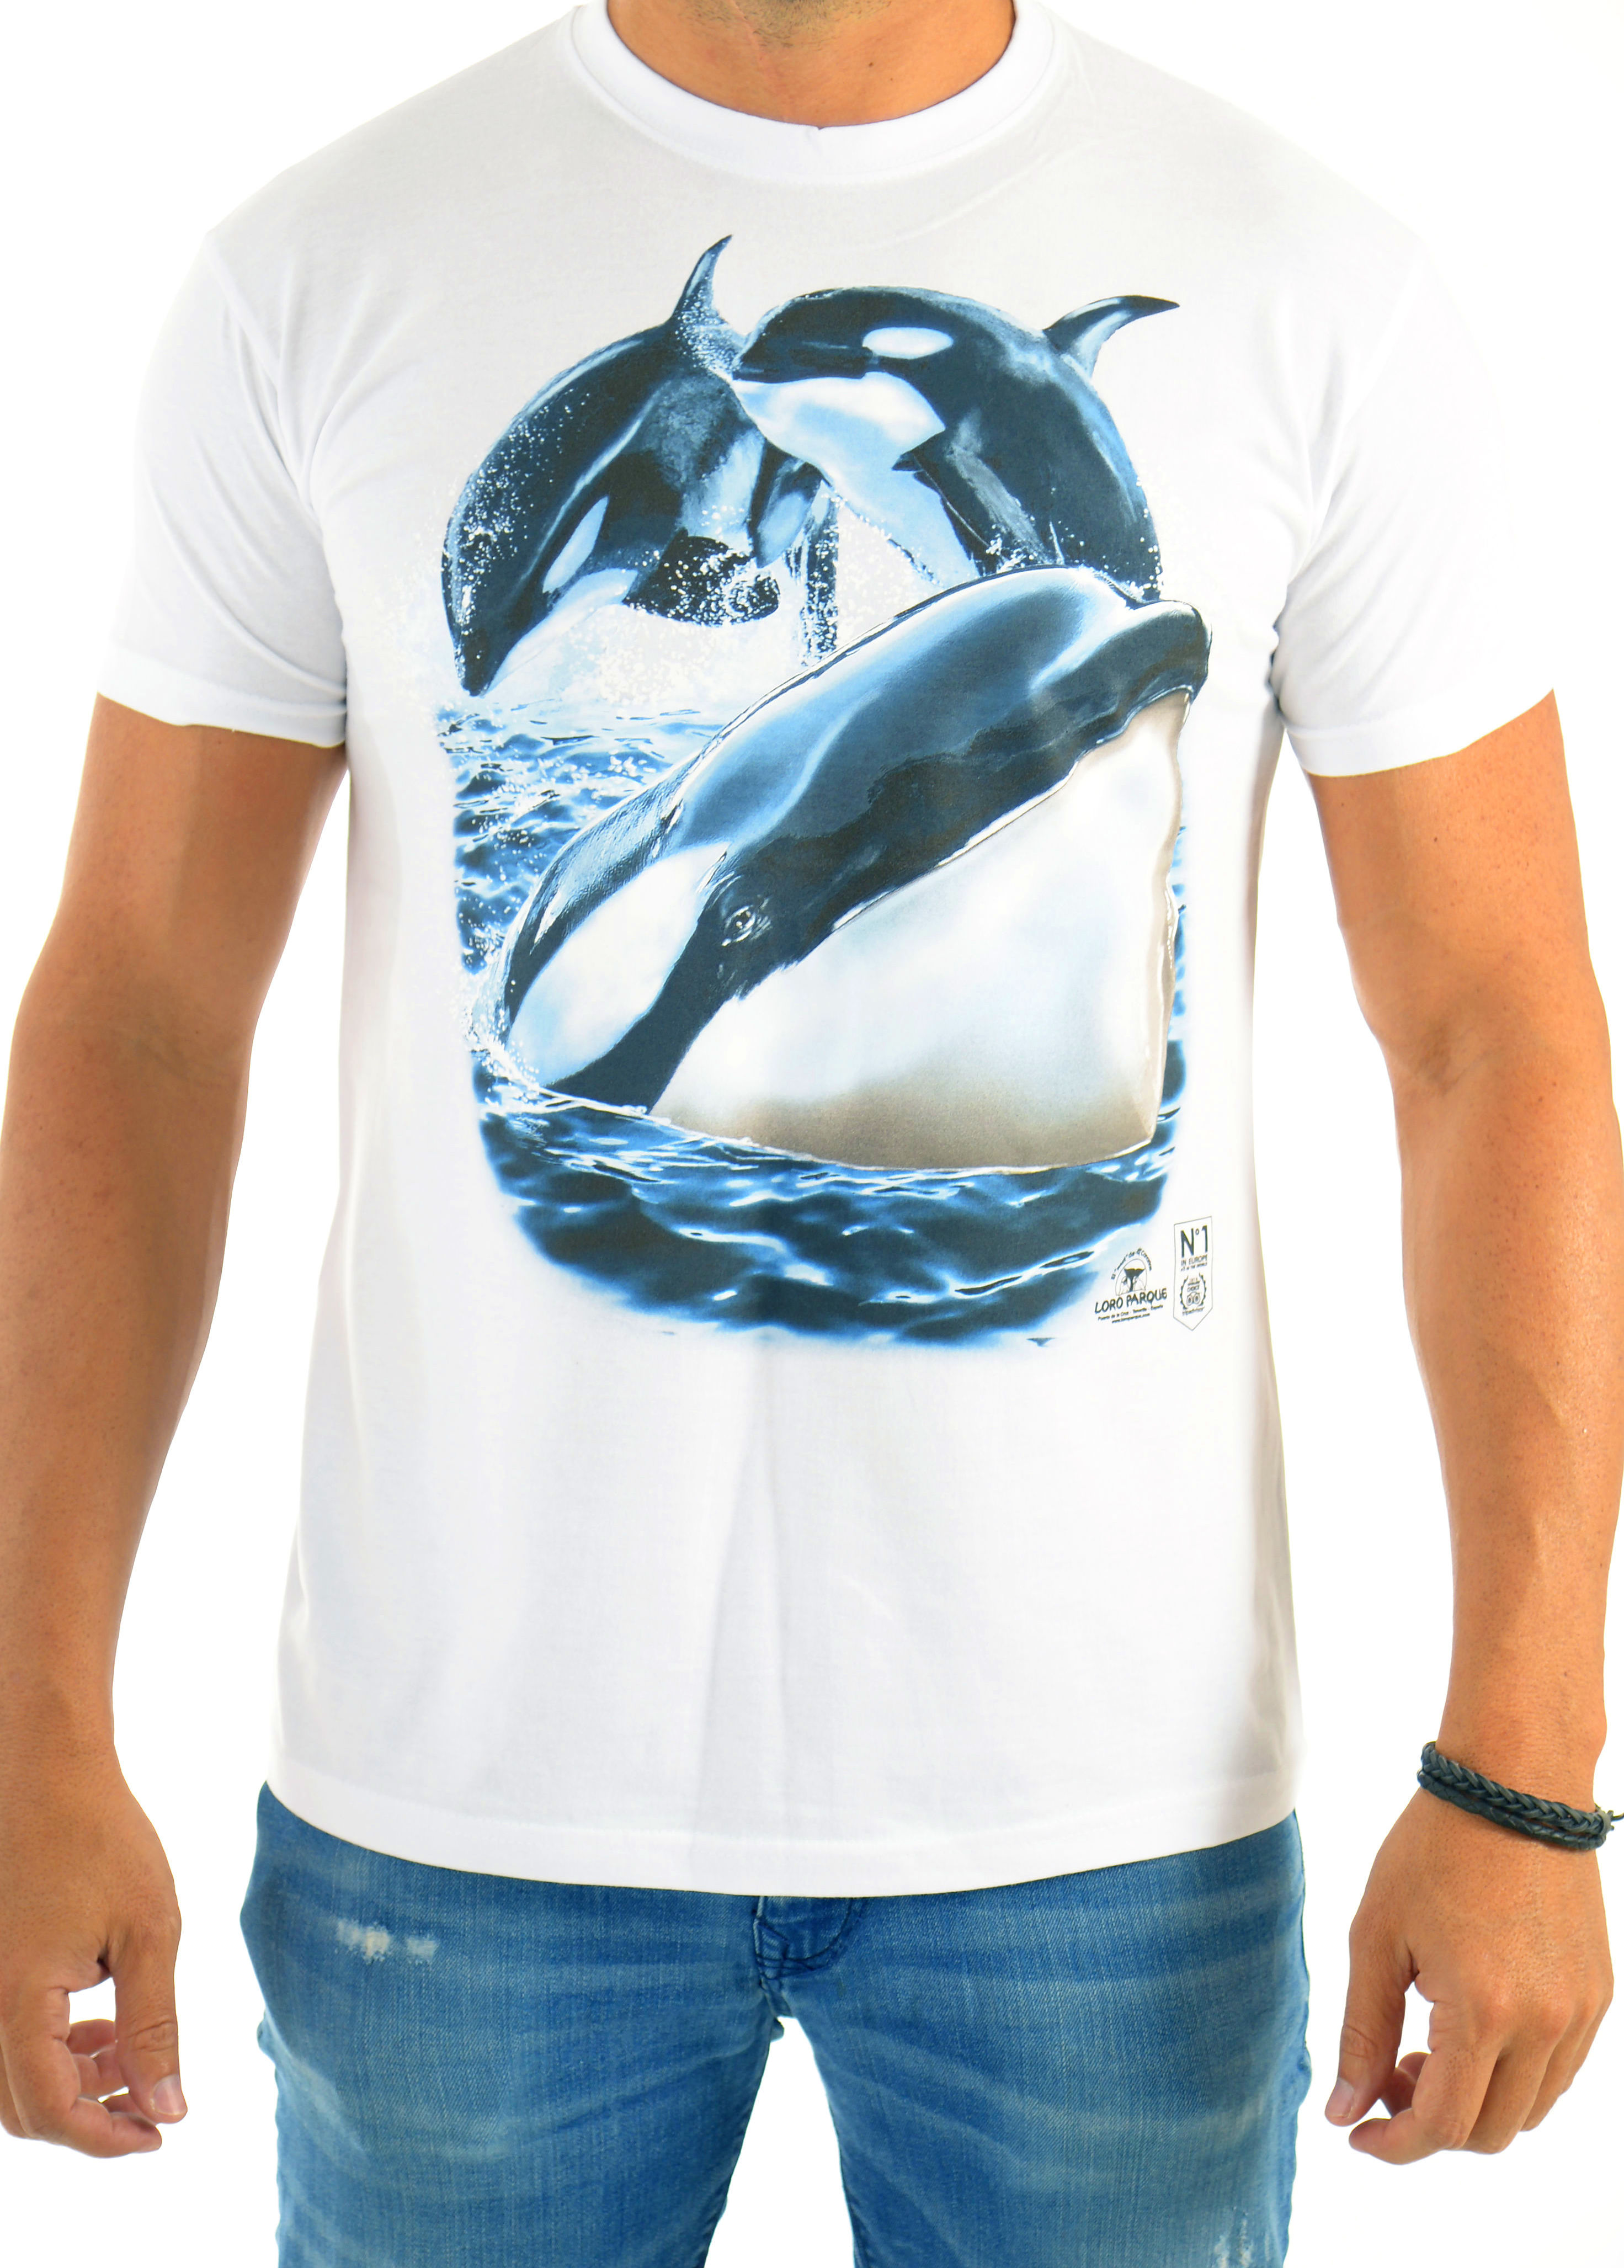 Camiseta Hombre 3 Orcas / 3 Whale´s  Man´s T-Shirt: Productos de BELLA TRADICION